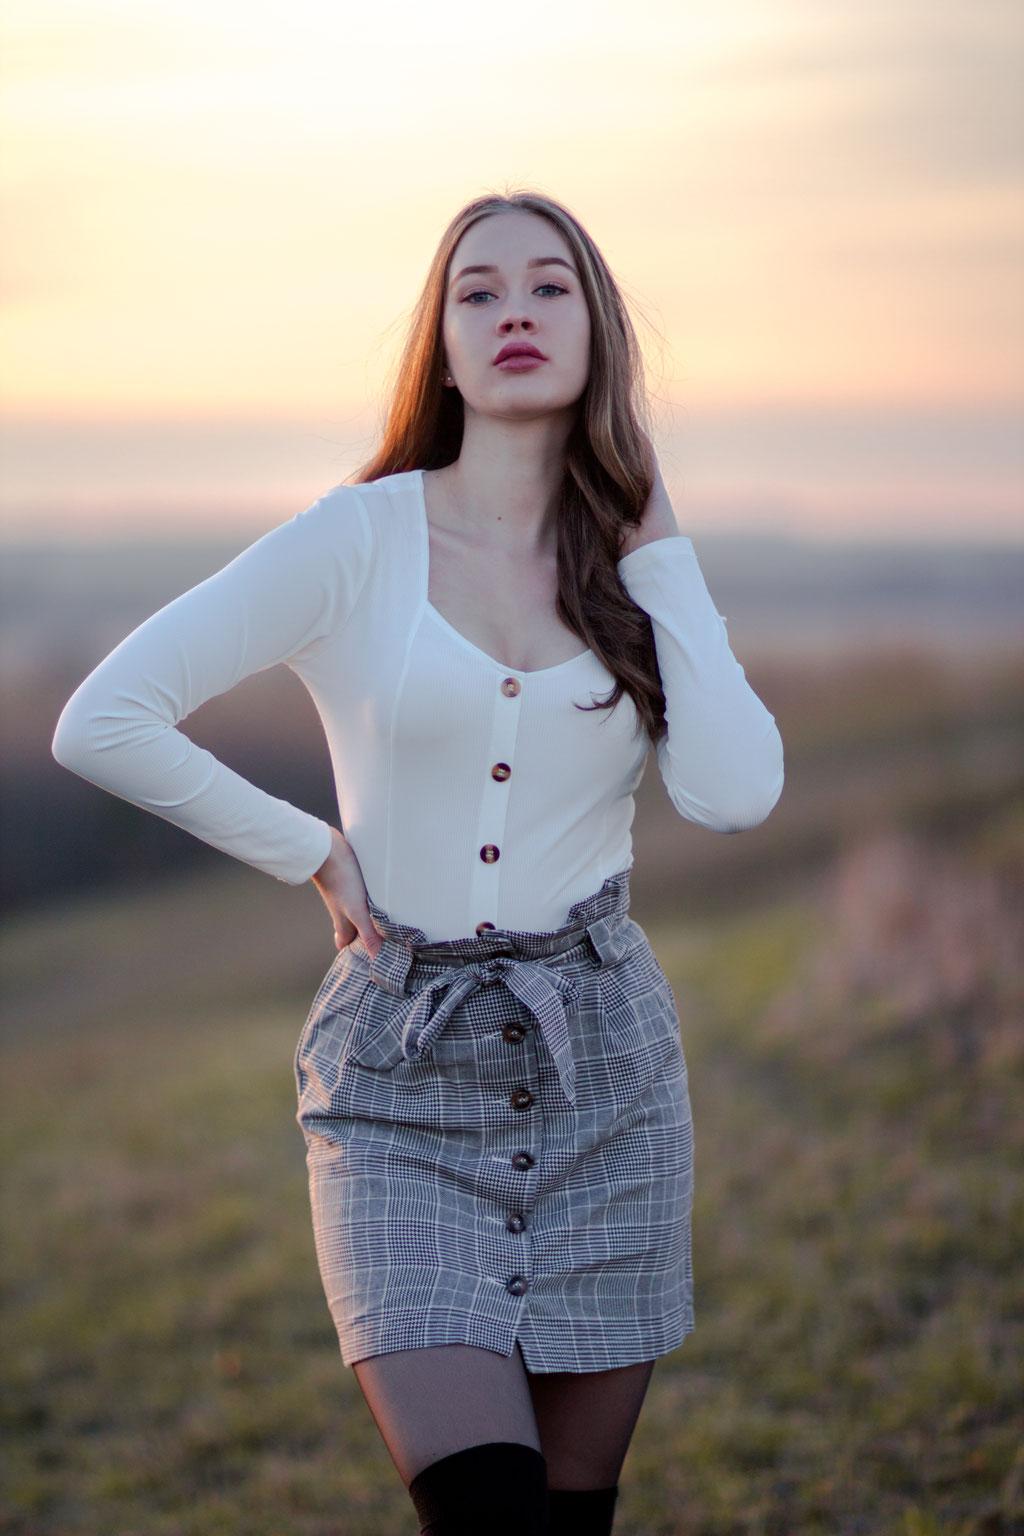 Portrait| Hendrikje Richert Fotografie| Gegenlicht| Abendsonne